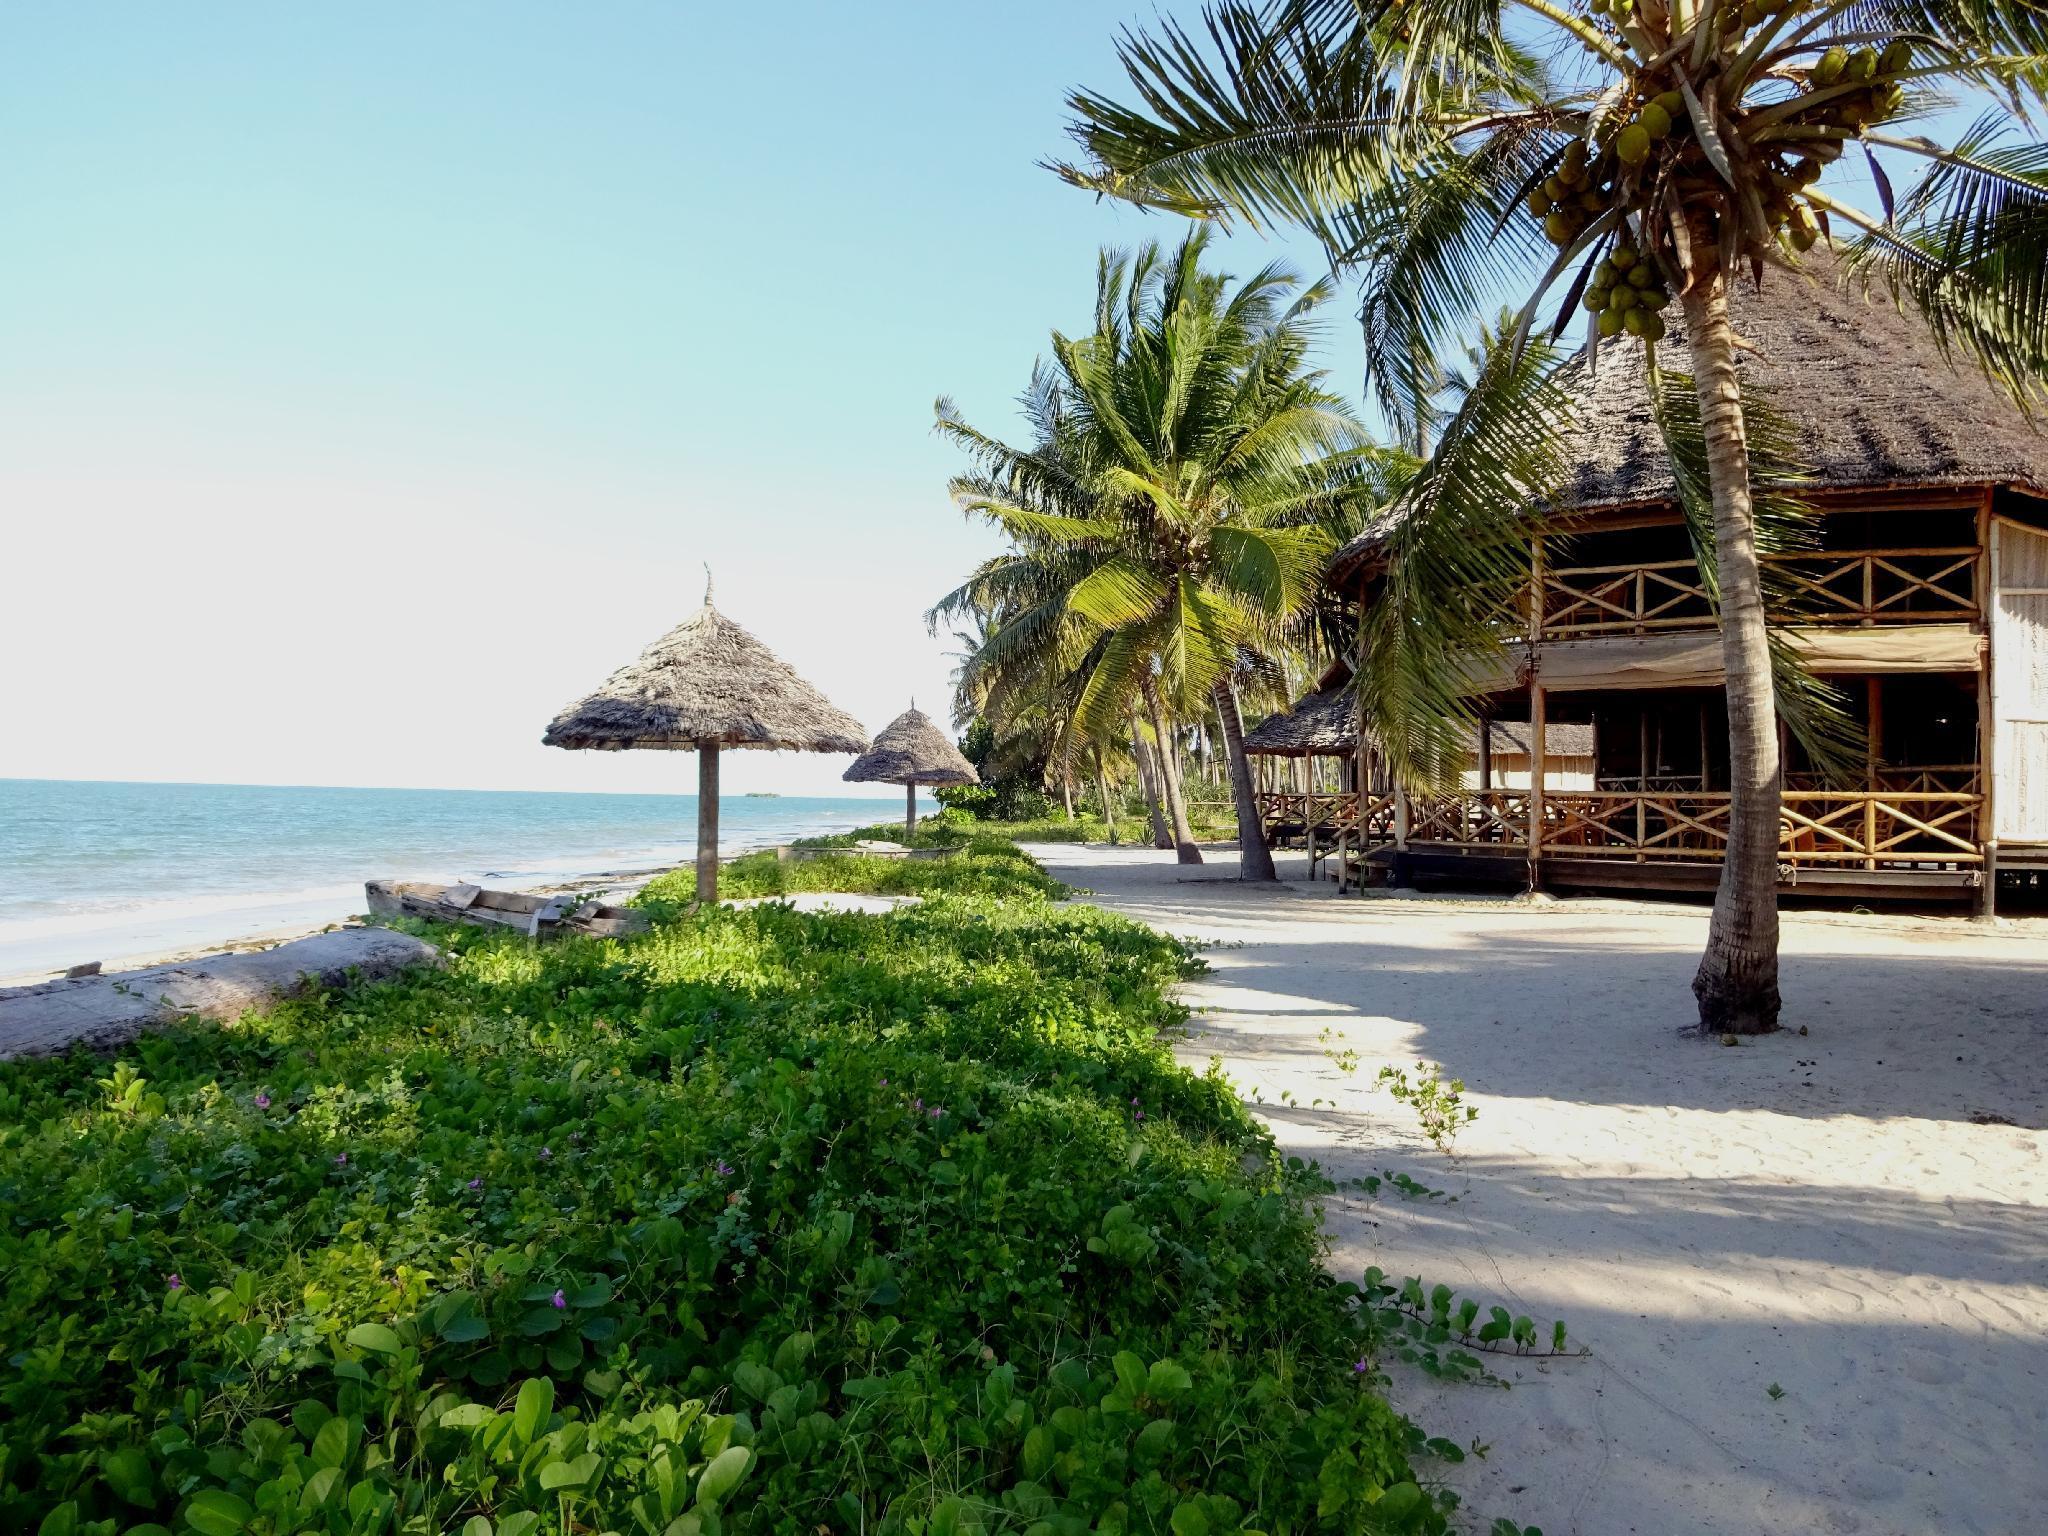 Barry's Beach Resort